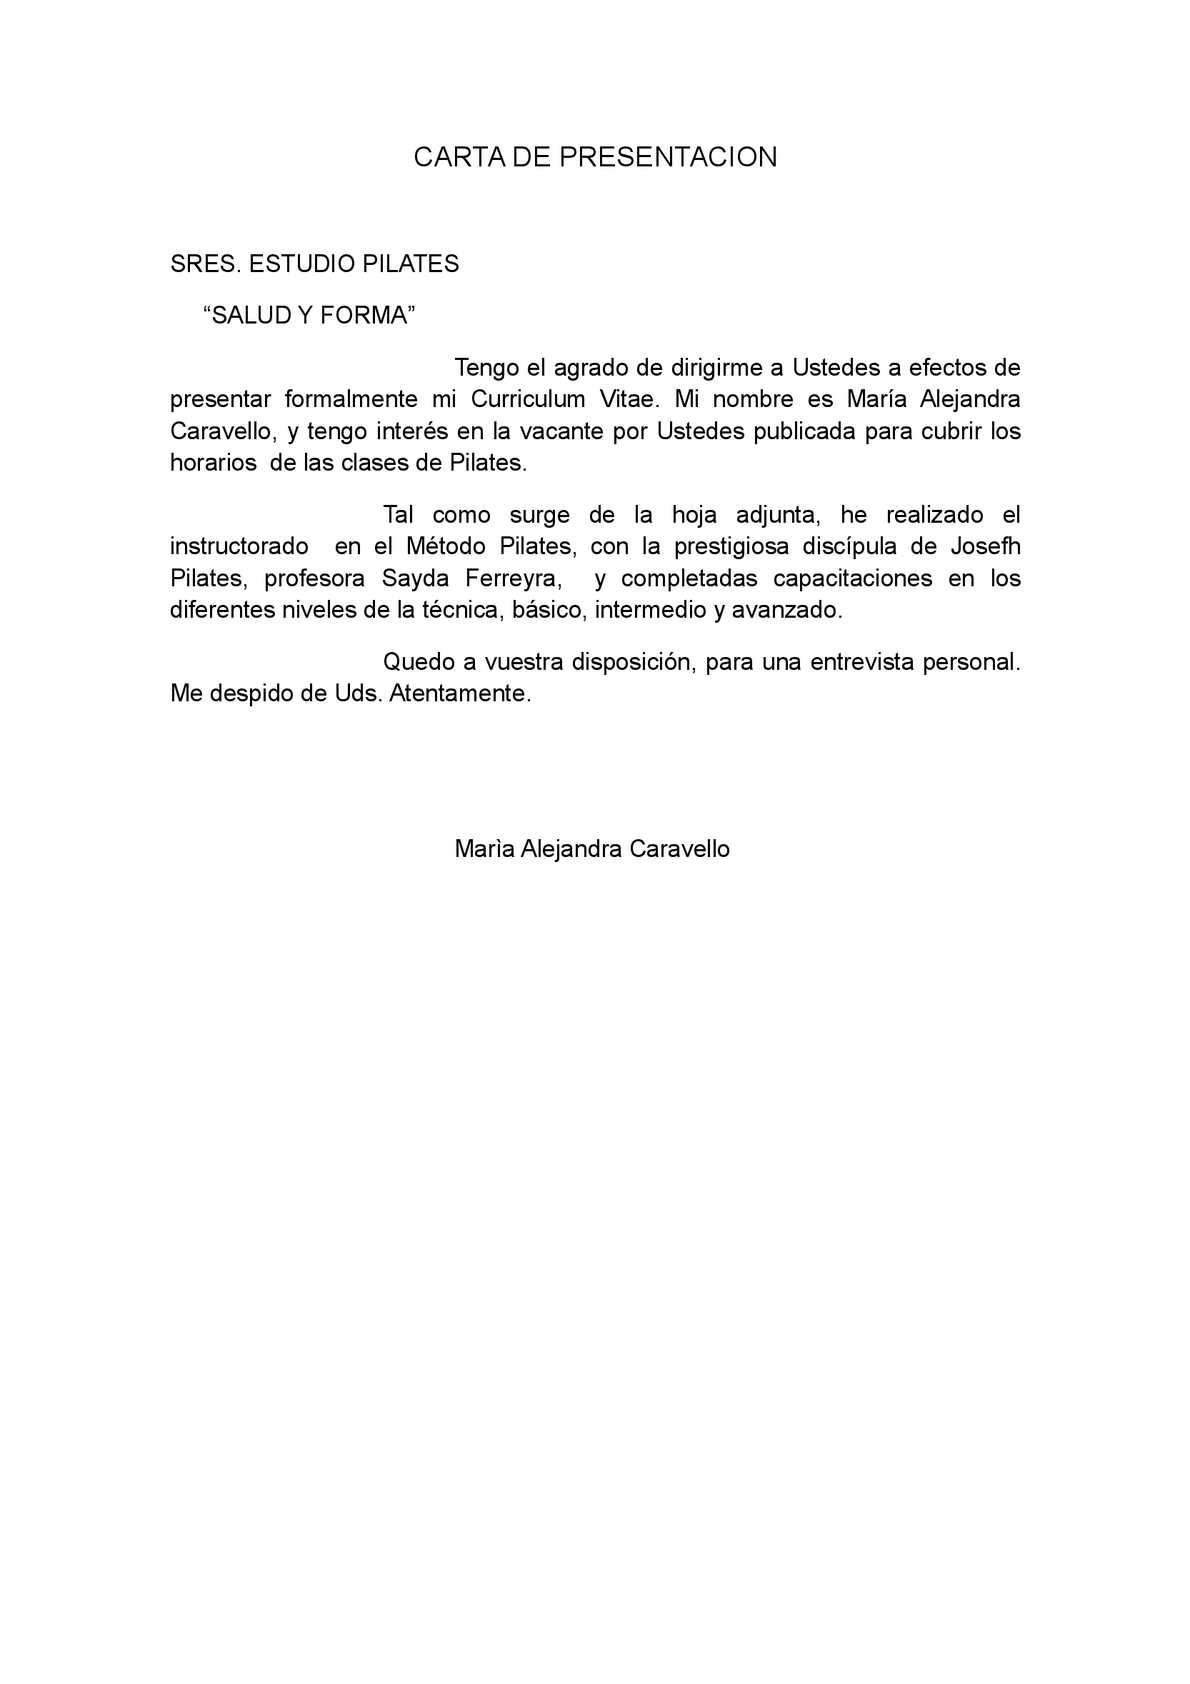 Calaméo - CARTA DE PRESENTACION